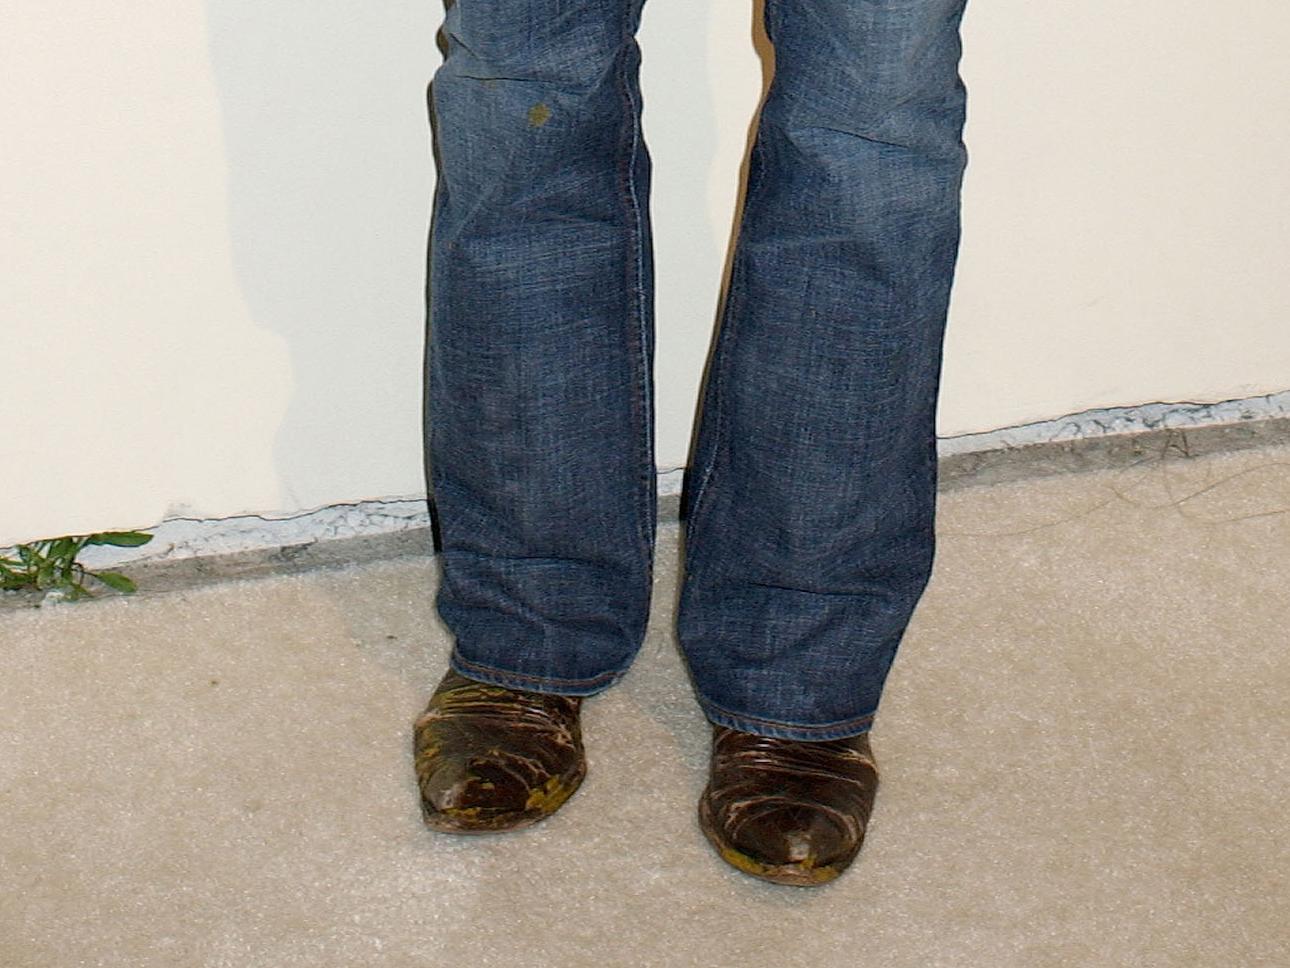 kiefer-sutherland-jeans-43